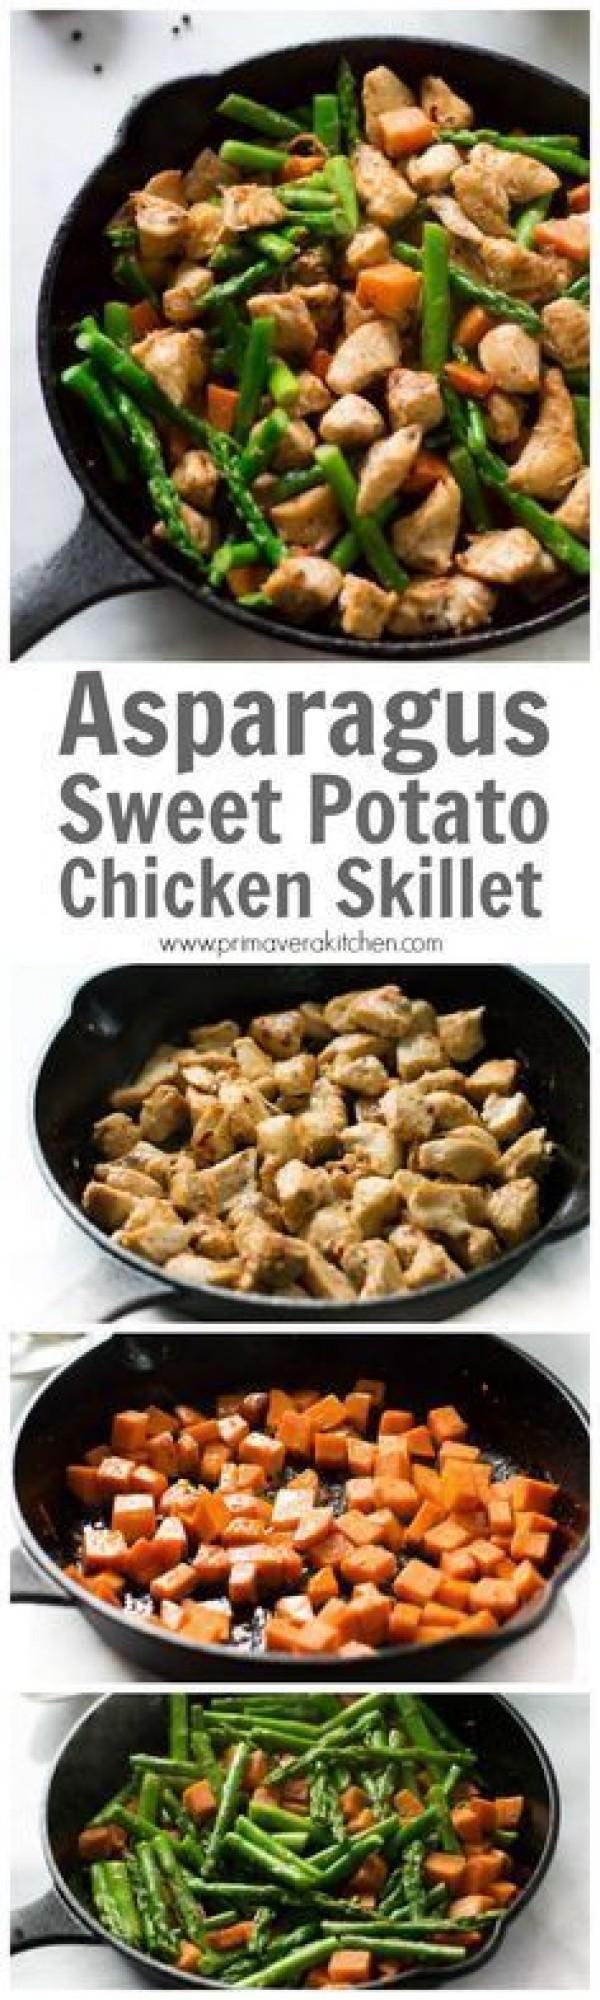 Get the recipe Asparagus Sweet Potato Chicken Skillet @recipes_to_go